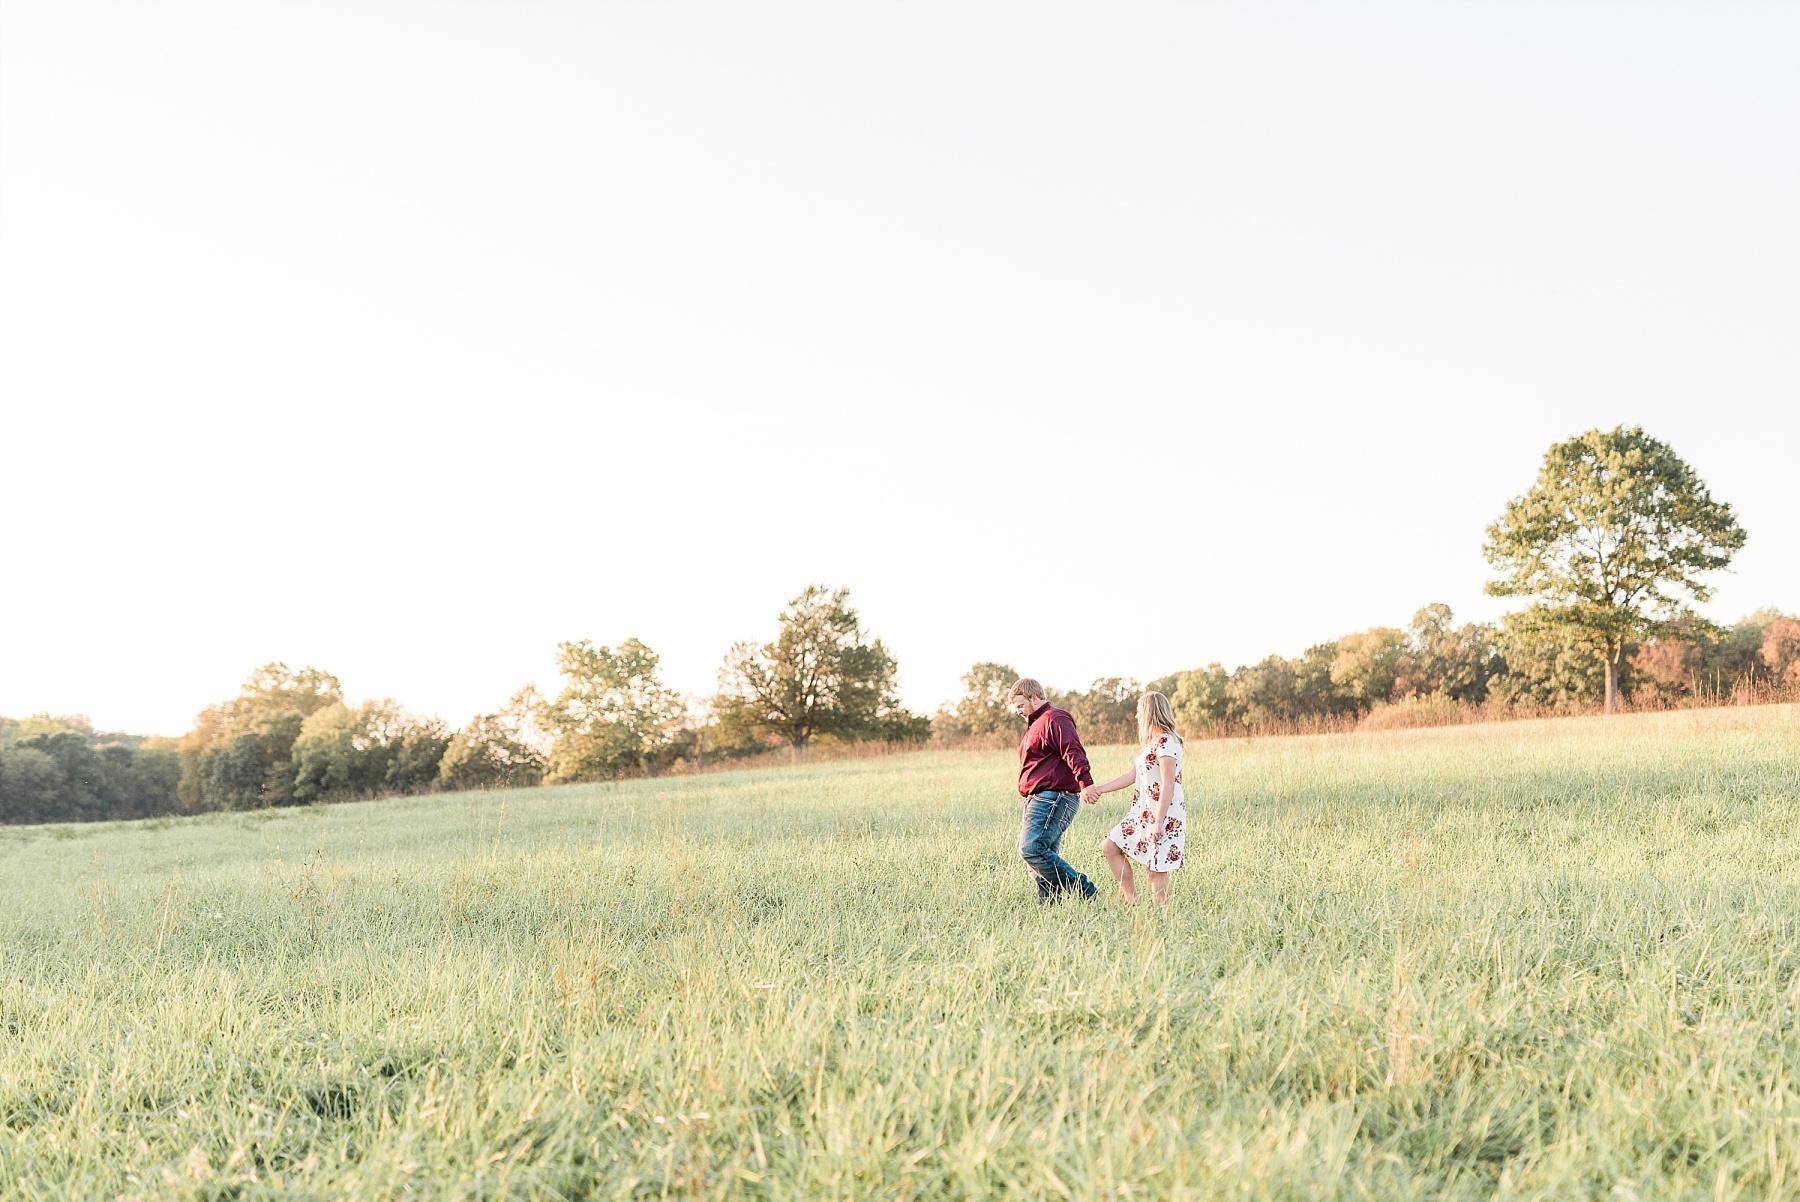 Autumn Golden Sunset Engagement Session on Farm in Missouri by Kelsi Kliethermes Photography_0002.jpg